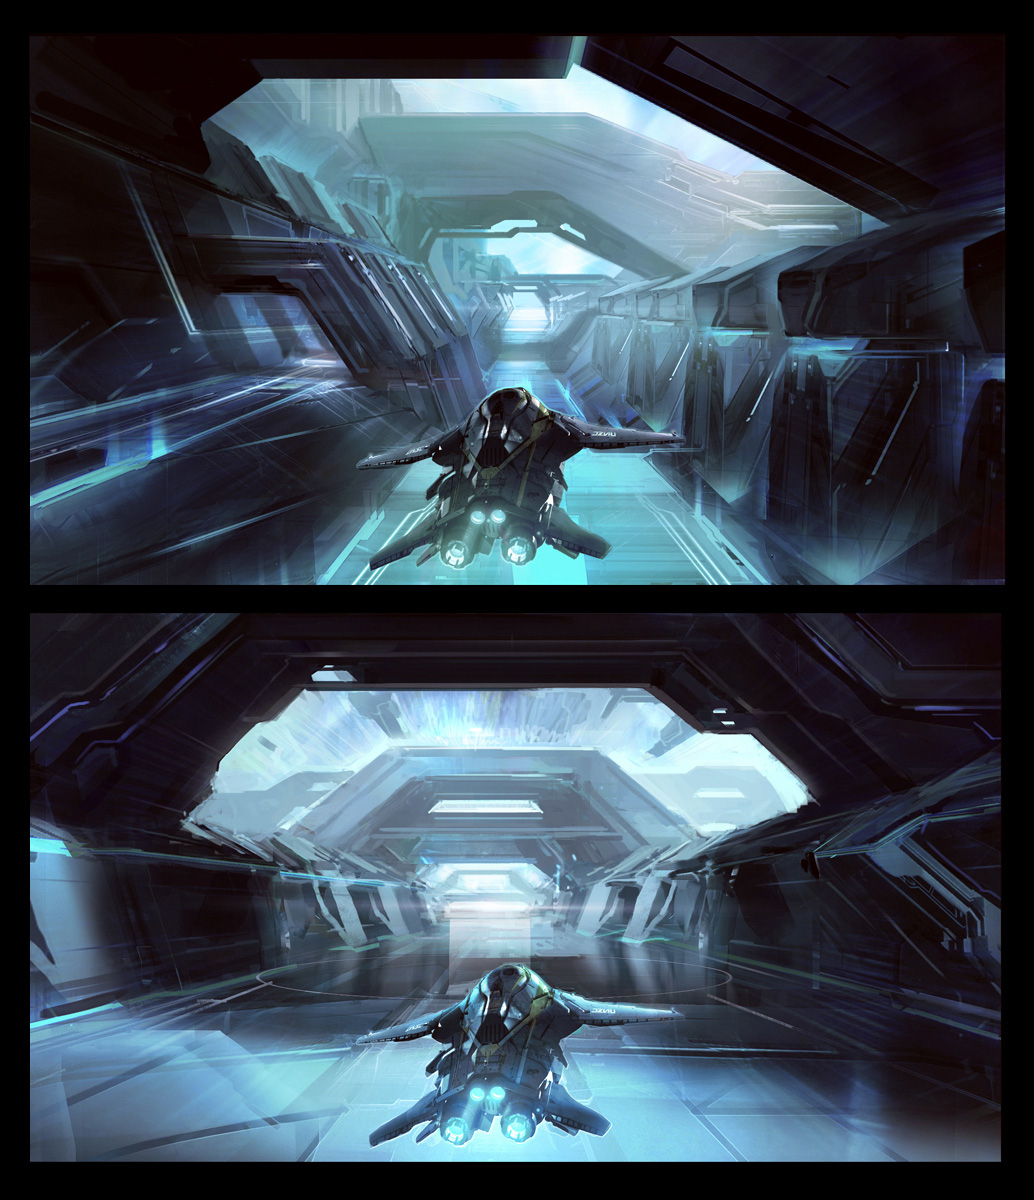 Art: Halo 4 Concept Art By Dave Bolton